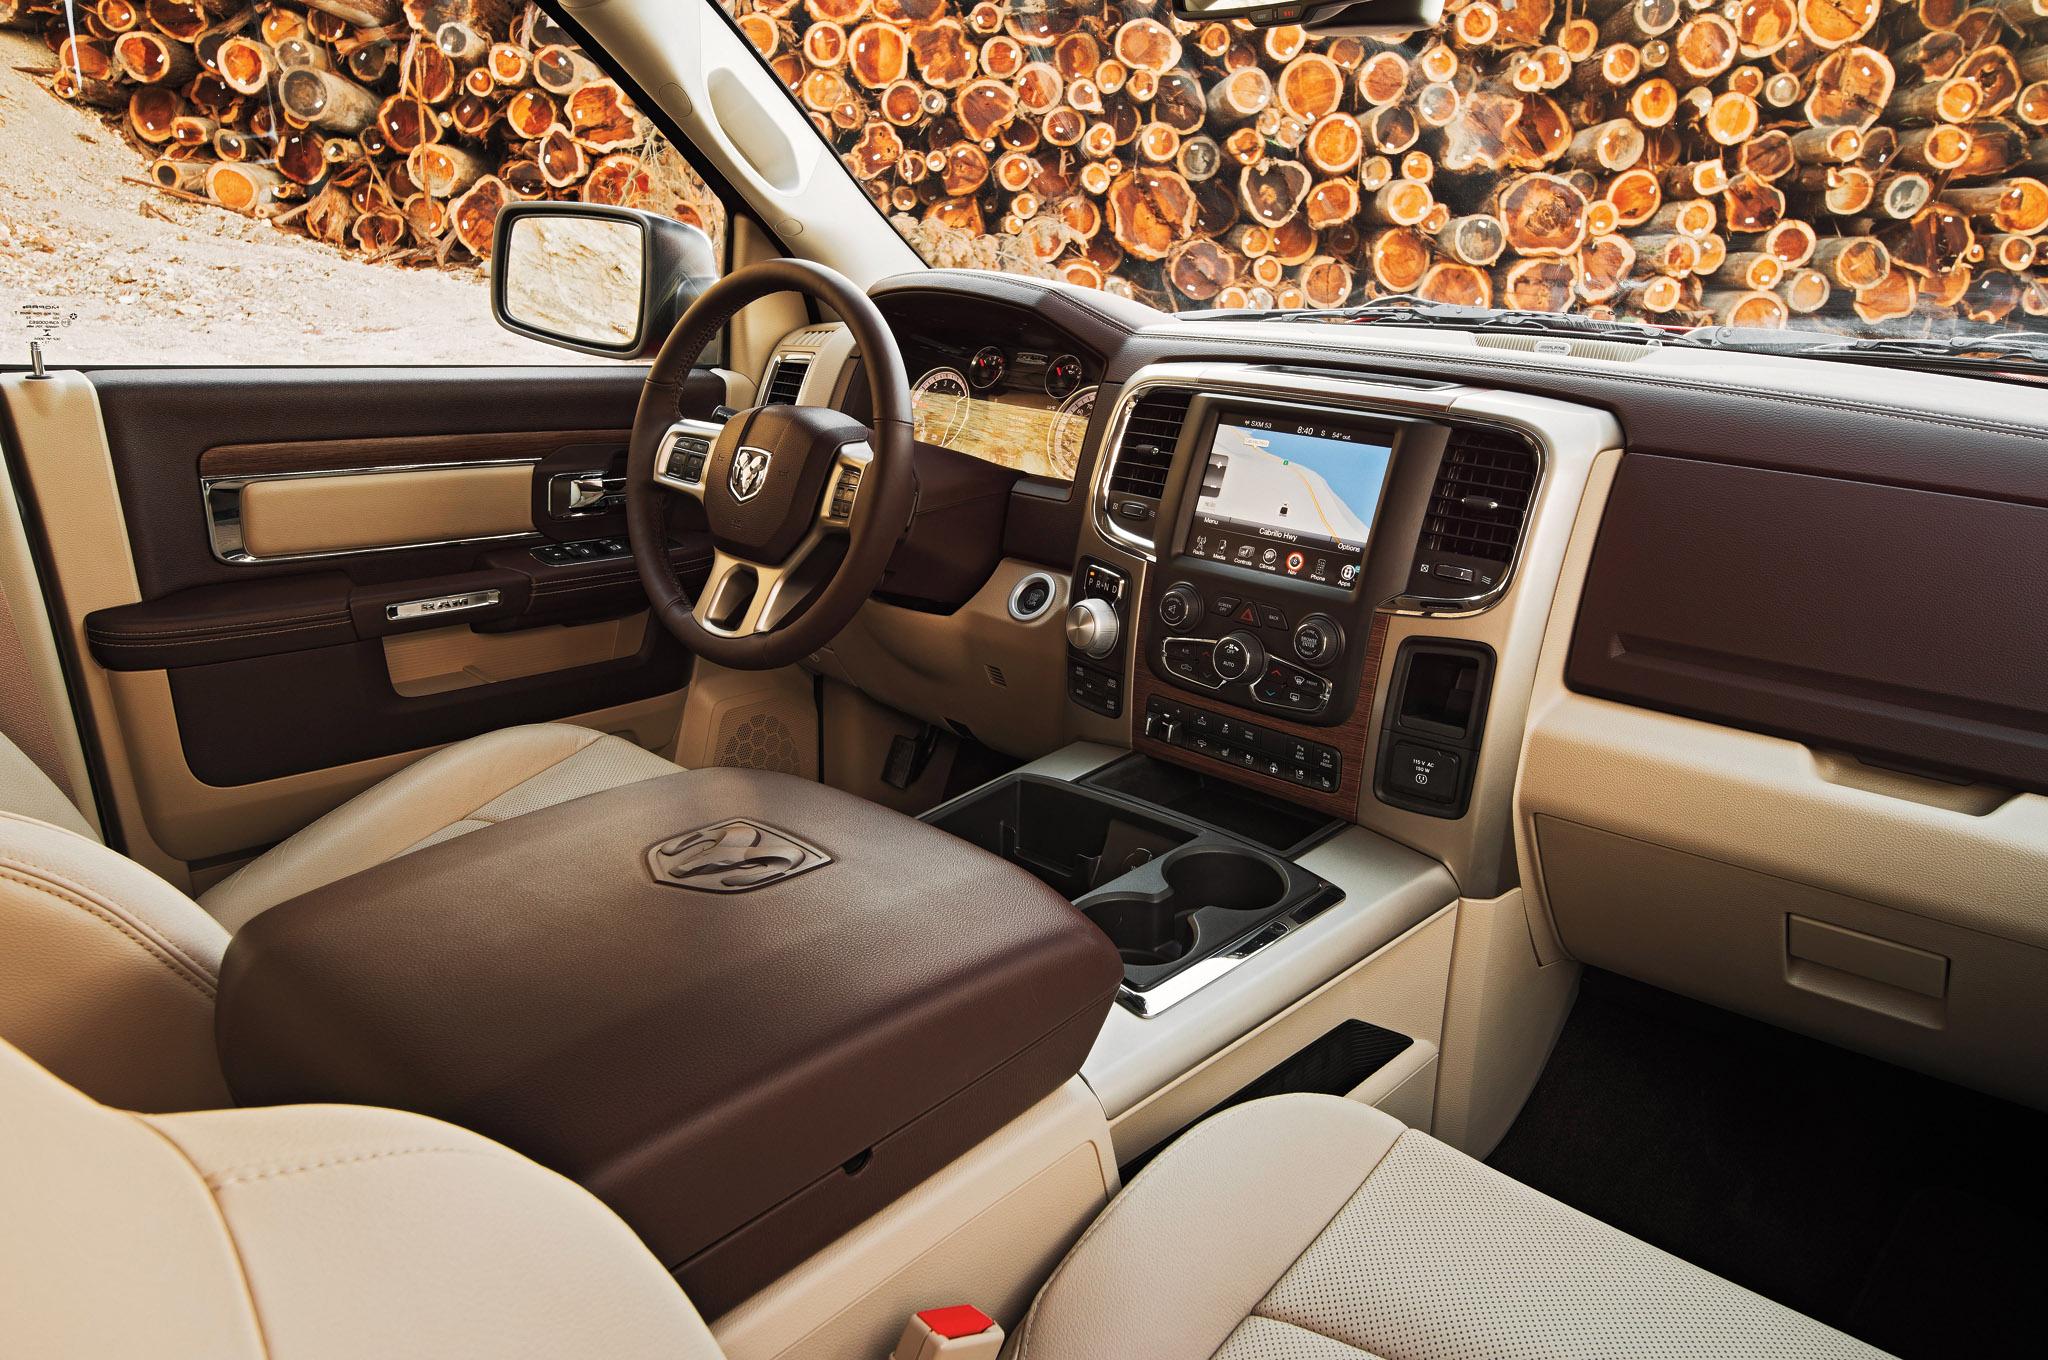 2014 Dodge Ram 1500 EcoDiesel Picture